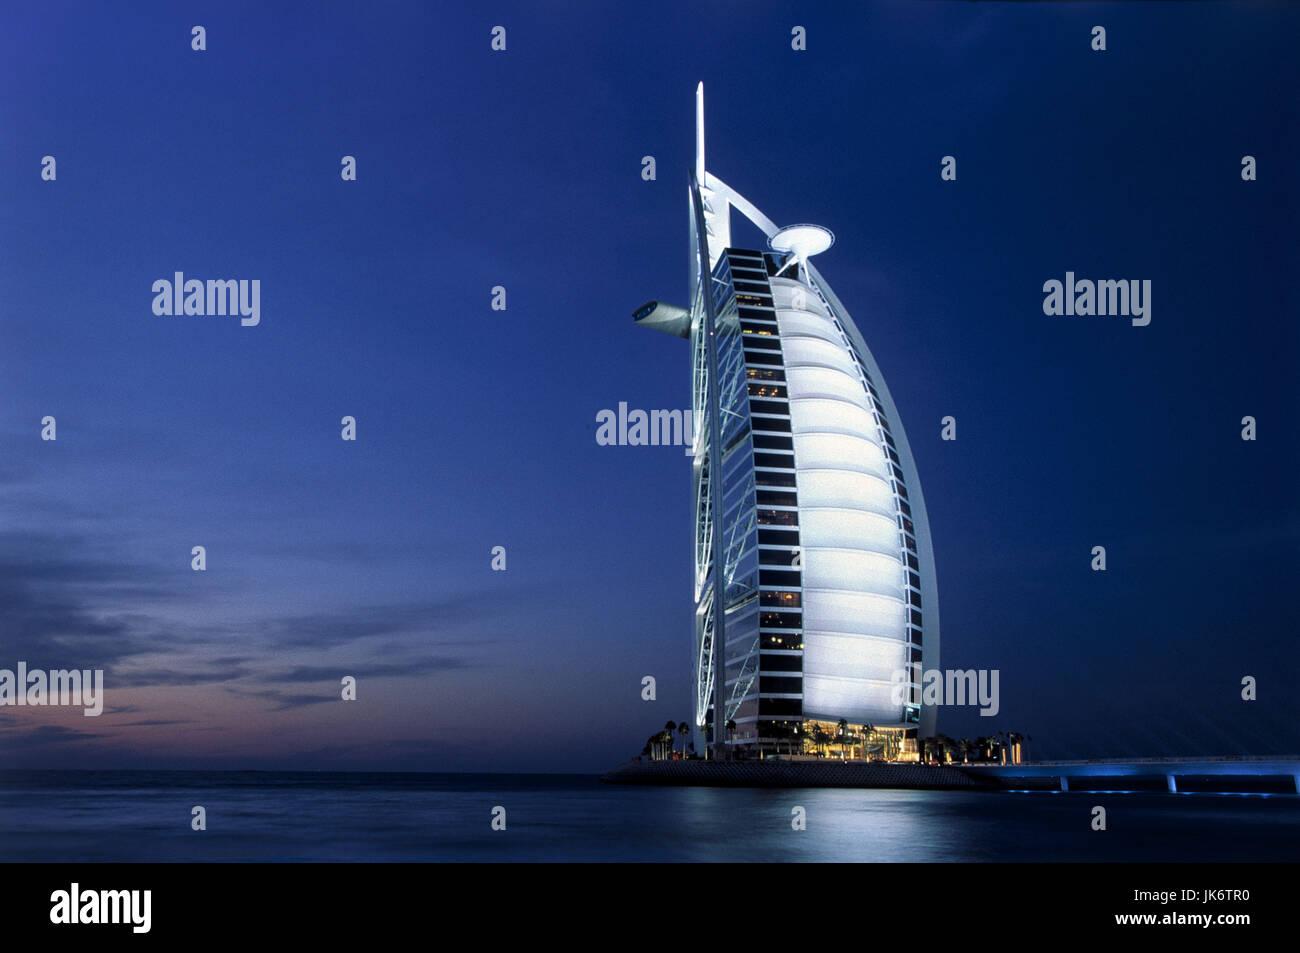 Vereinigte Arabische Emirate, Dubai, Meer, Hotel, Burj Al Arab,  Beleuchtung, Dämmerung VAE, UAE, Luxushotel, - Stock Image